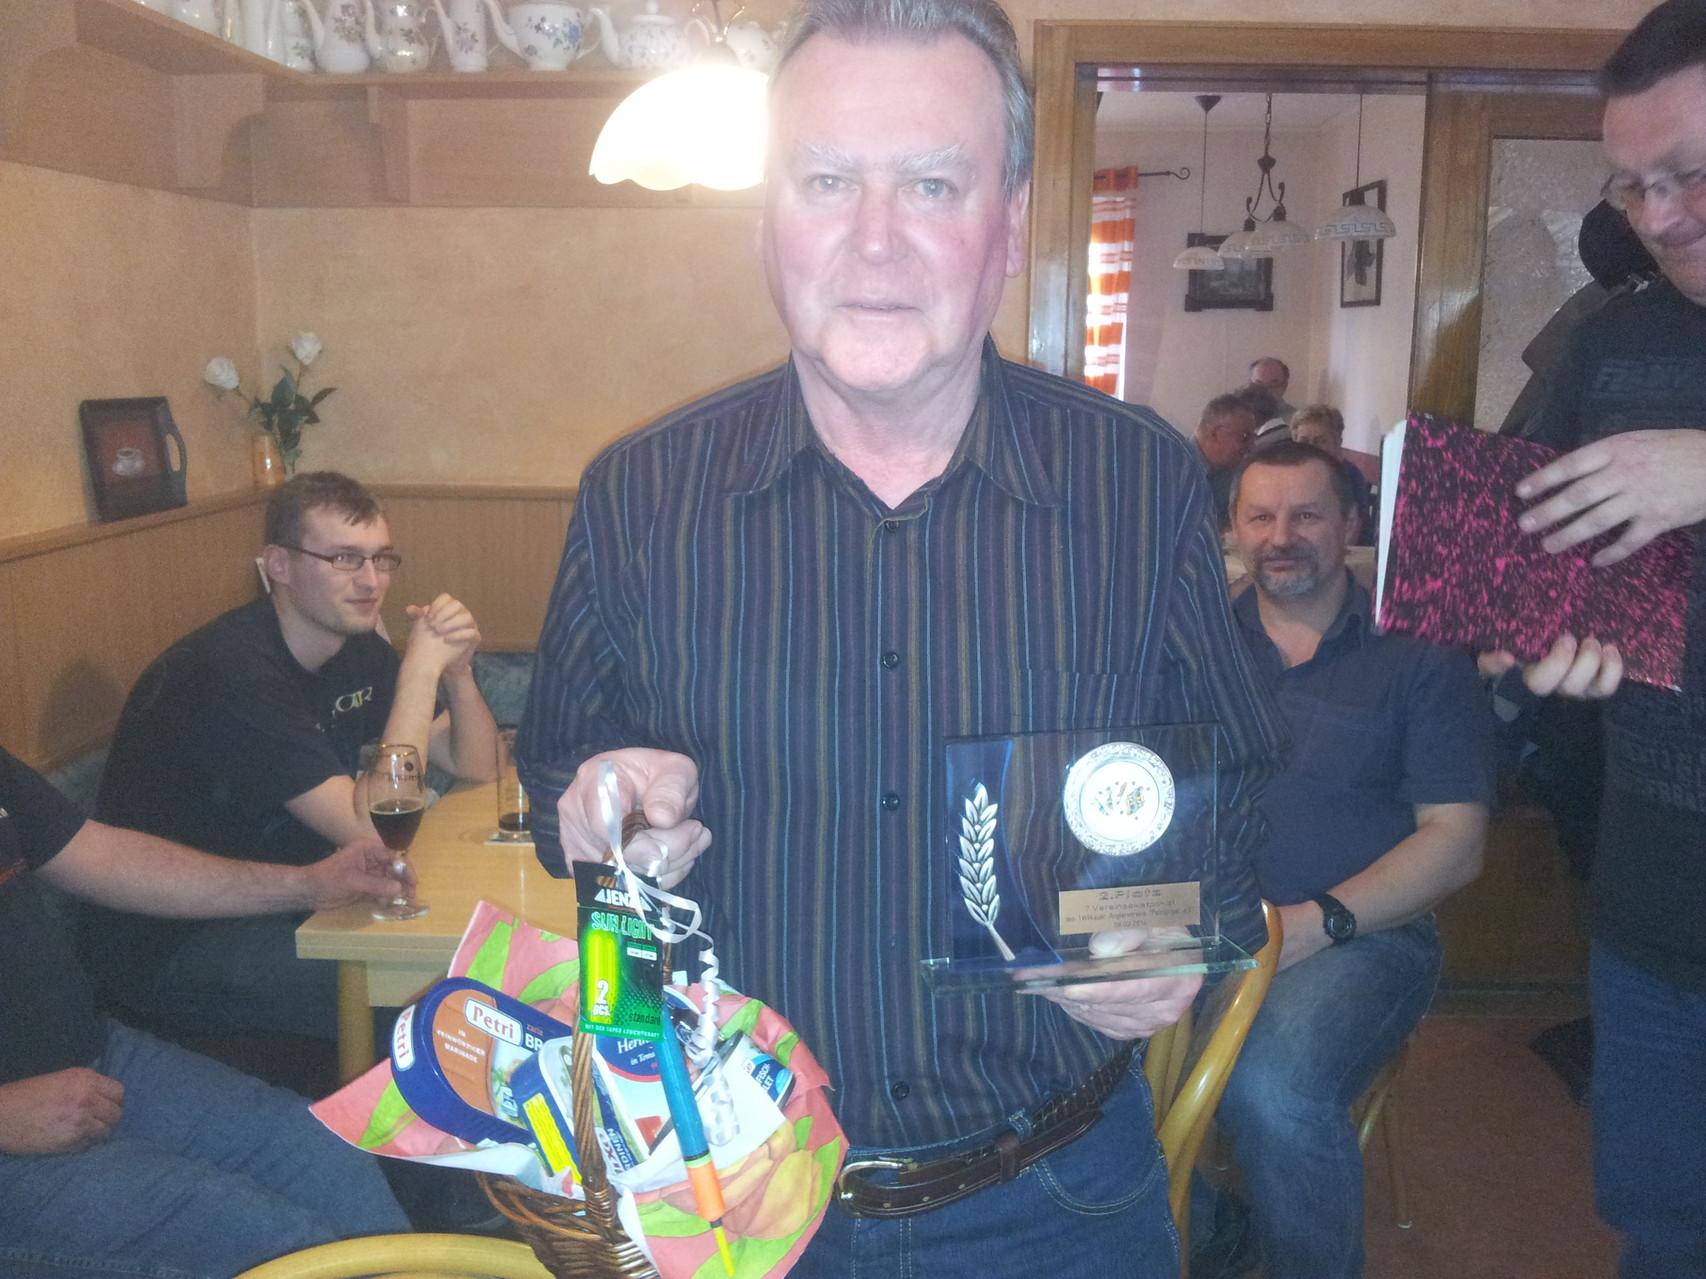 2. Platz - Ralf Koch - 2457 Punkte